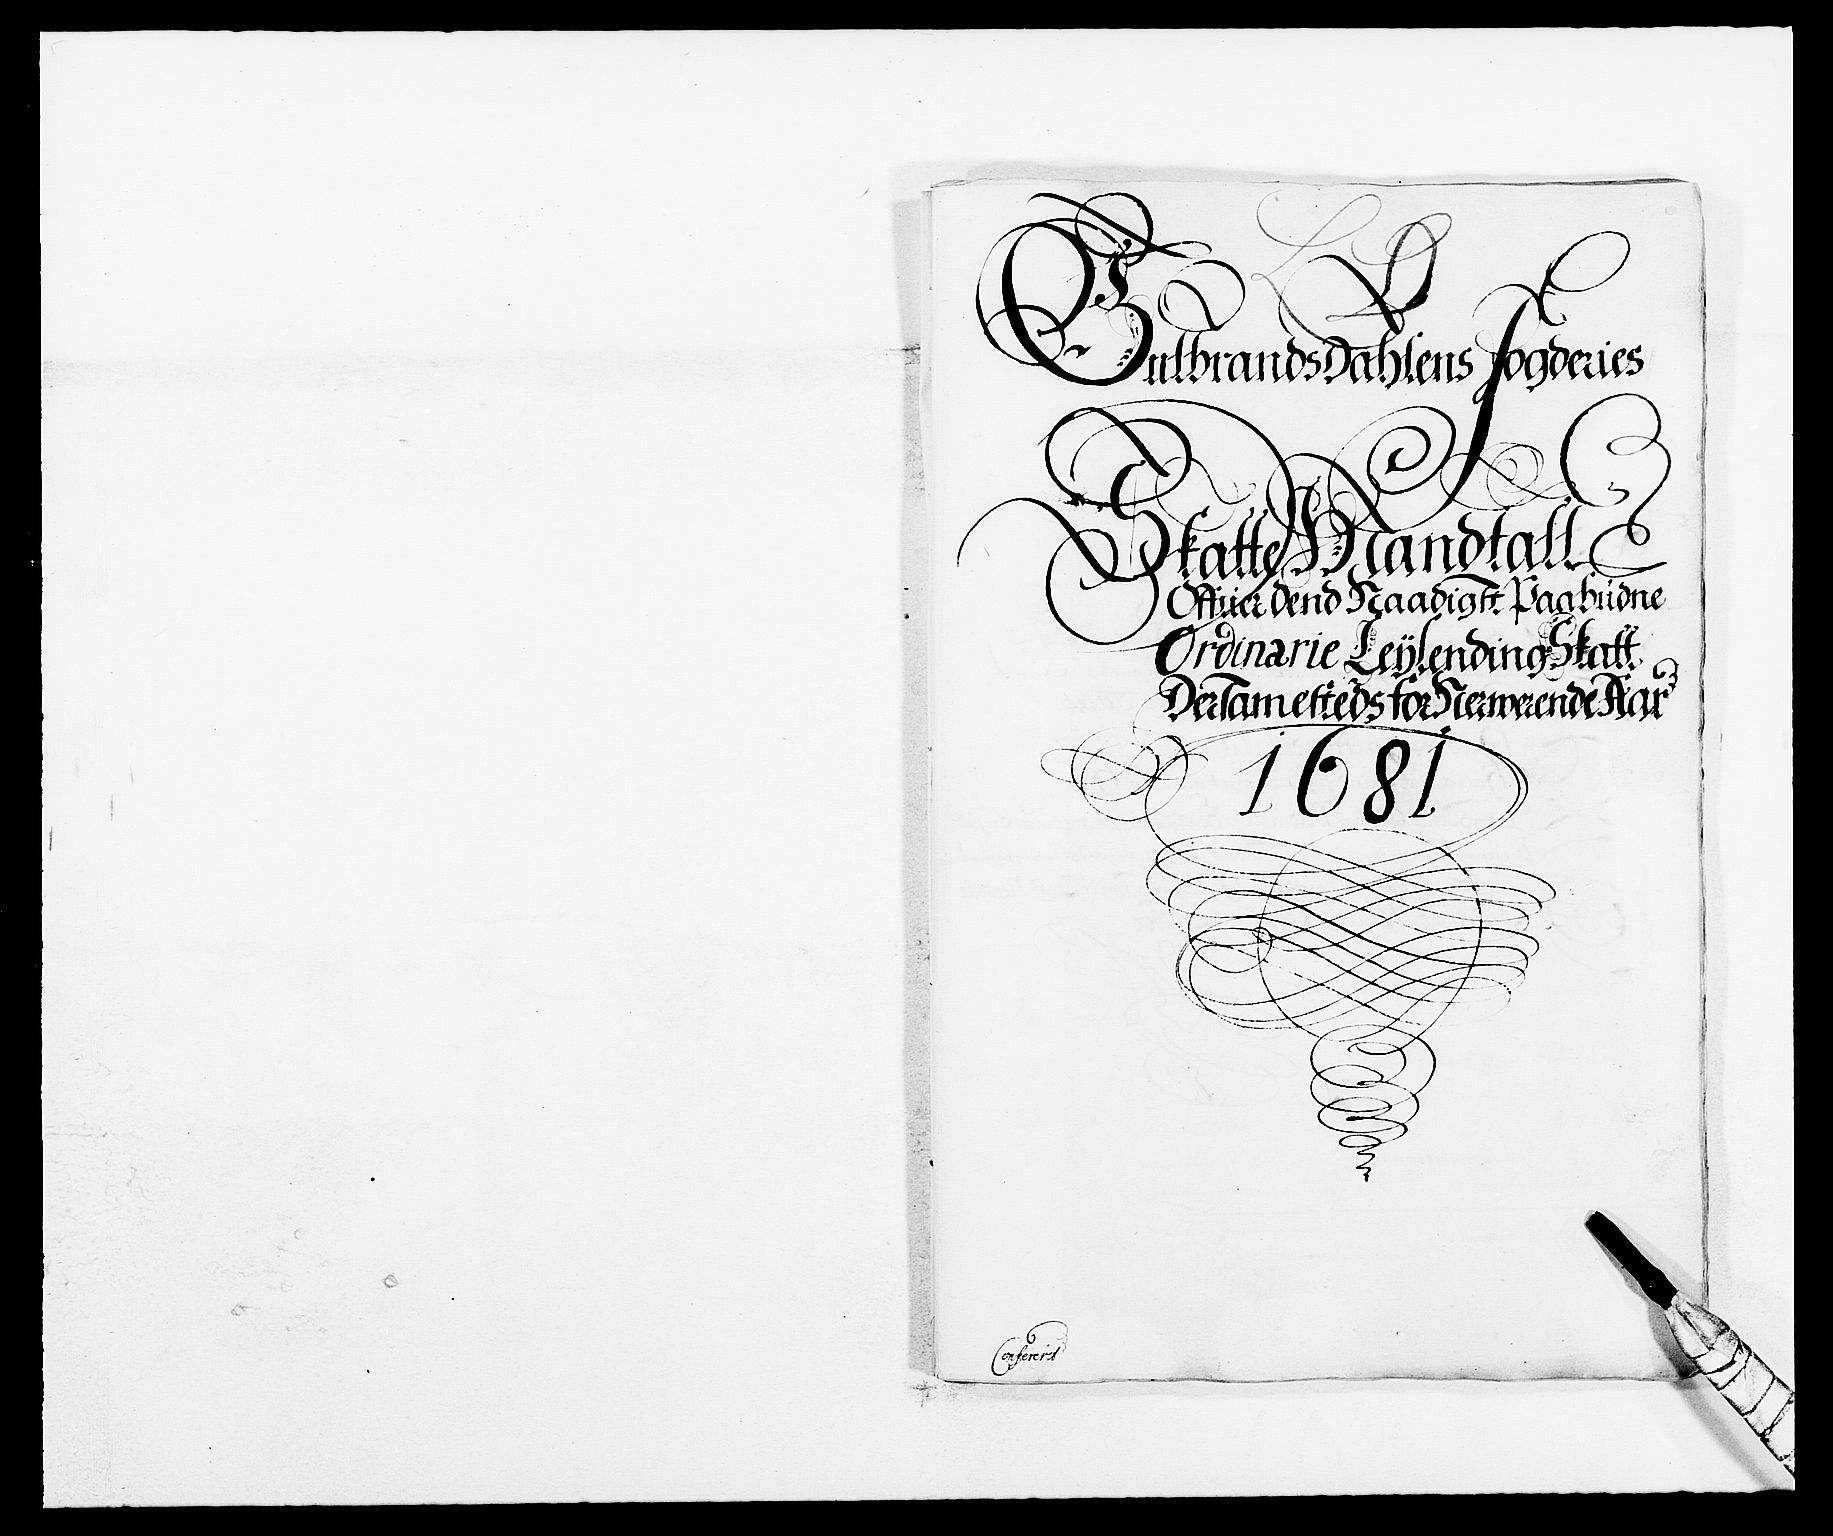 RA, Rentekammeret inntil 1814, Reviderte regnskaper, Fogderegnskap, R17/L1156: Fogderegnskap Gudbrandsdal, 1681, s. 1